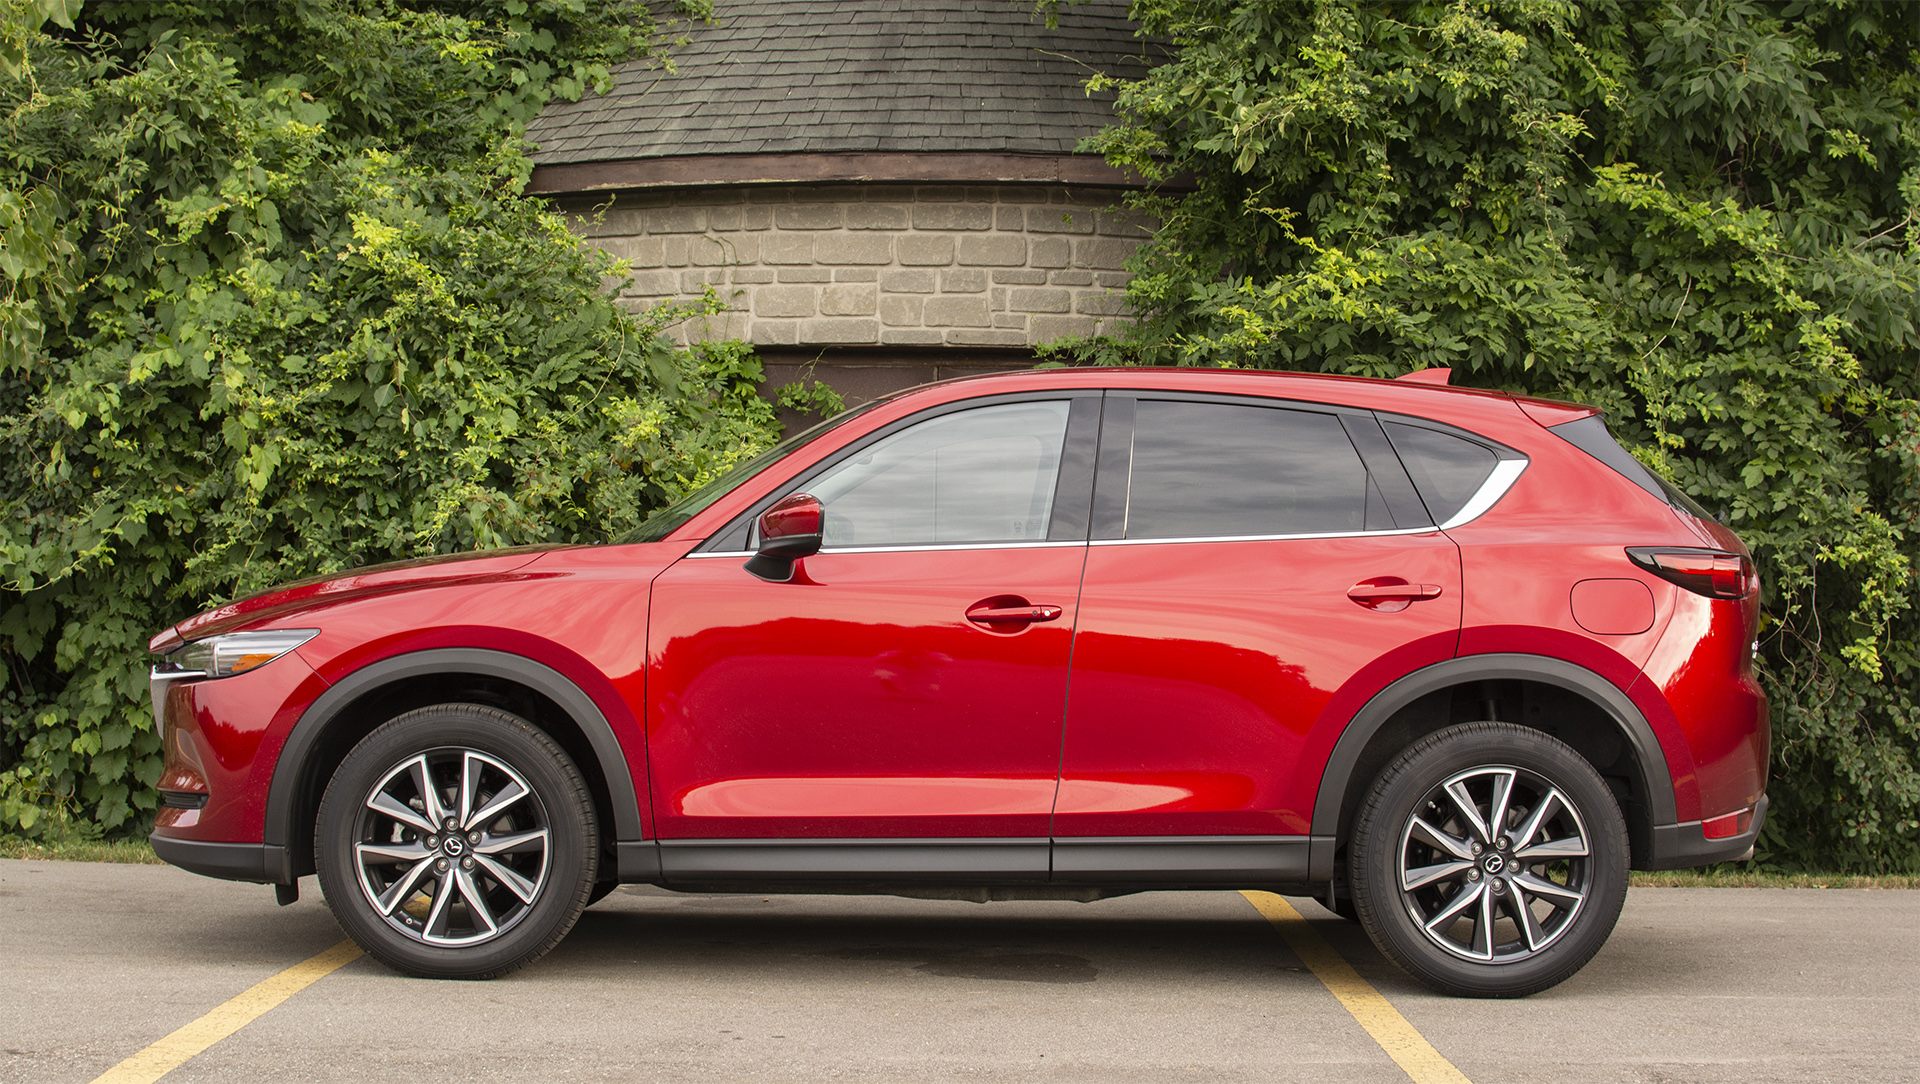 2018 Mazda CX-5 - iSeeCars.com